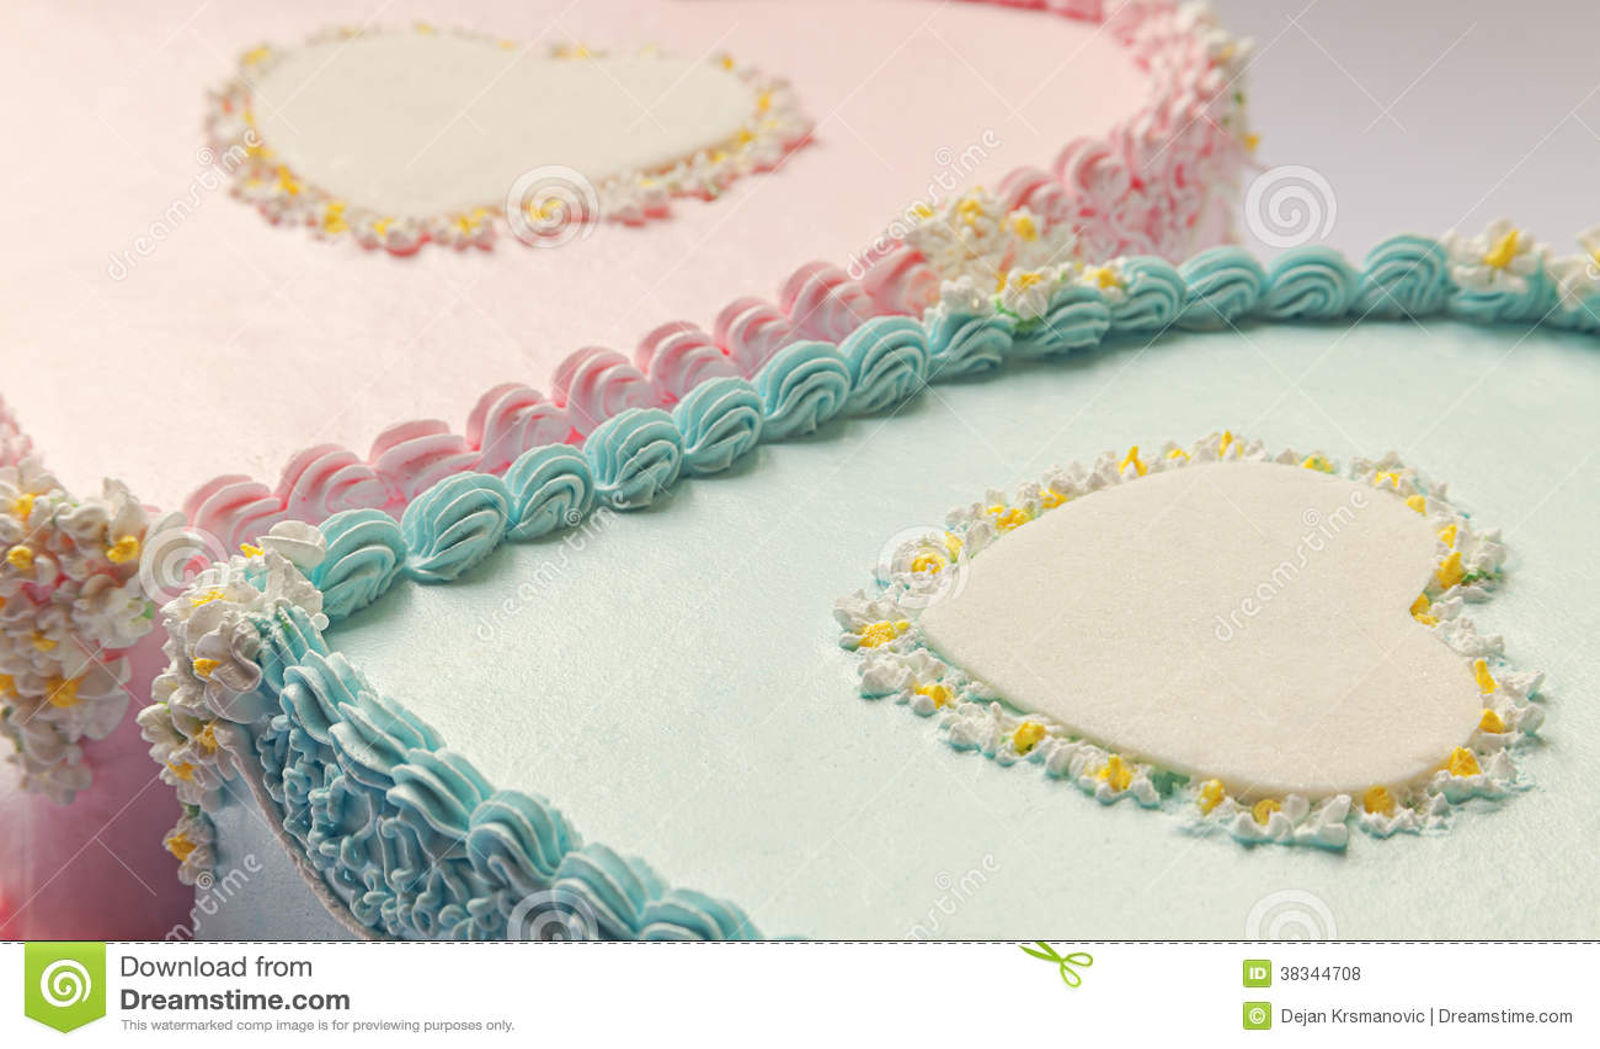 Birthday Cakes Stock Photo Image Of Plate Girl Entertaining